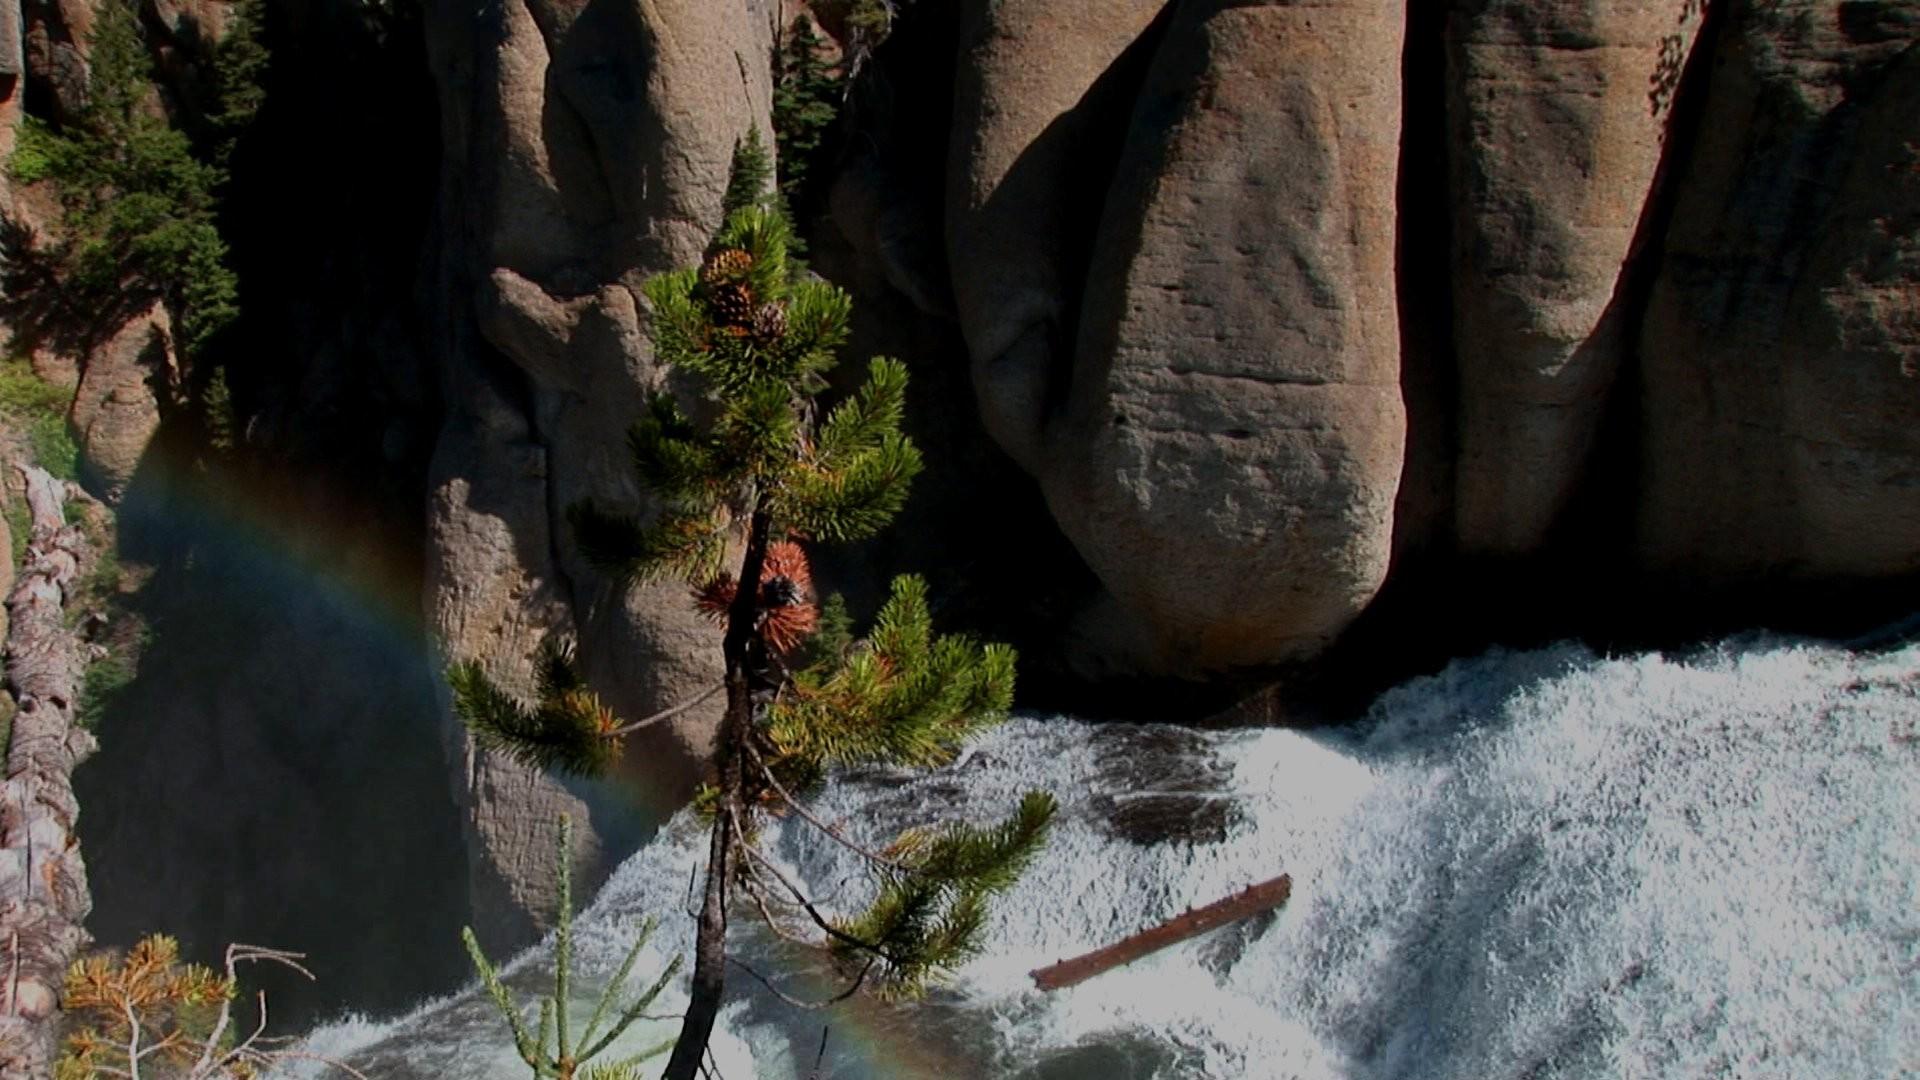 Yellowstone Waterfalls Screen Saver Screensaver Images Terraced Waterfall  Stories